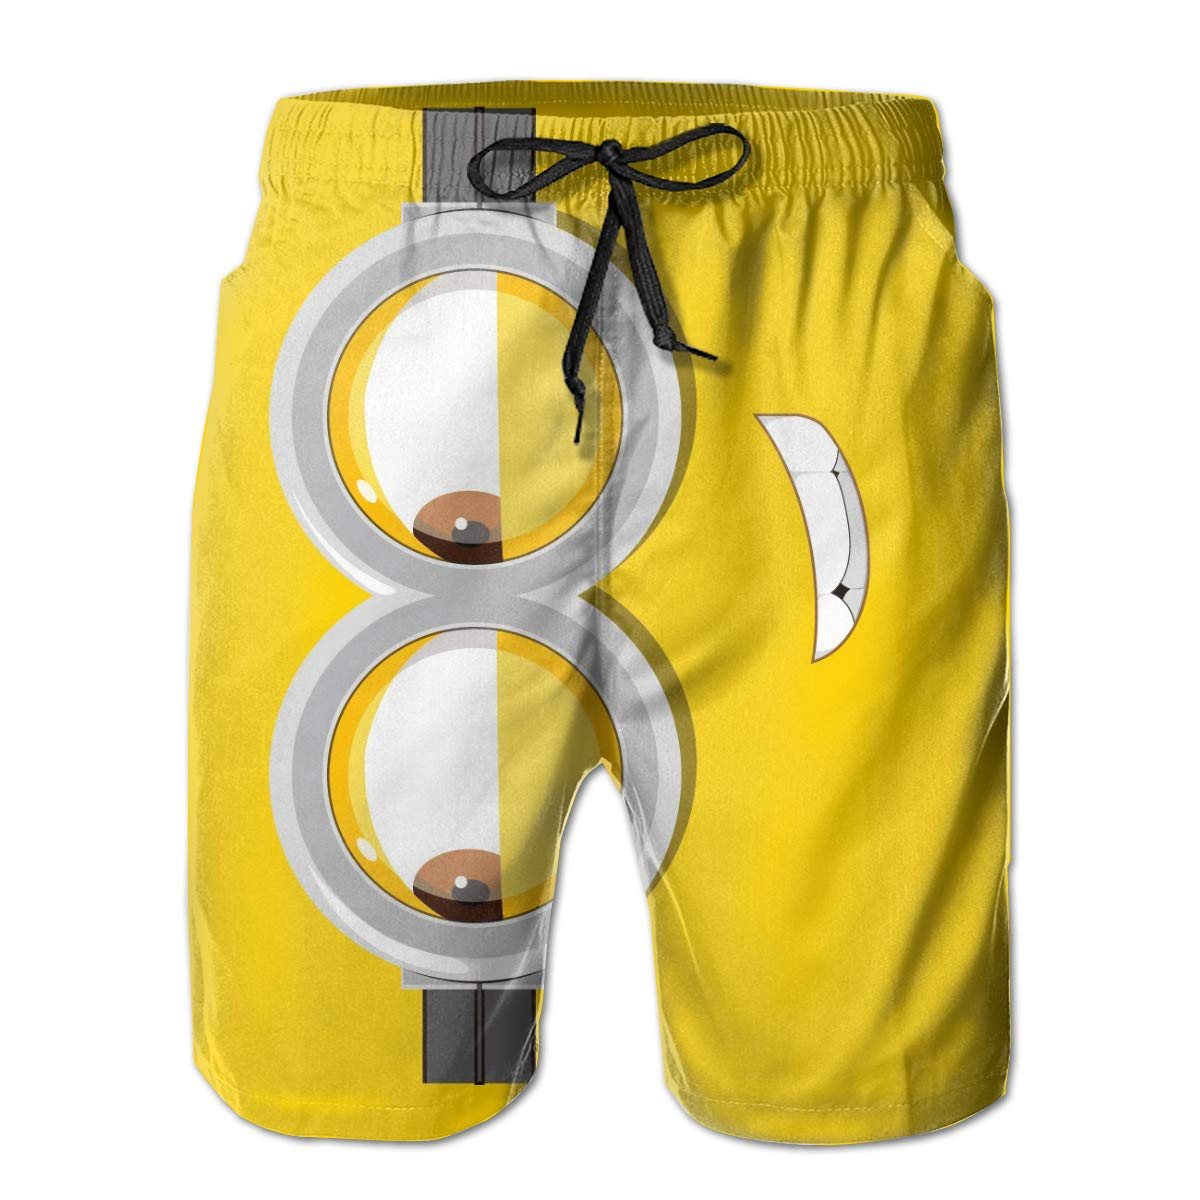 be23848709 Lovely Minion Face Men's Beach Shorts Linen Casual Fit Short Swim Trunks    Amazon.com